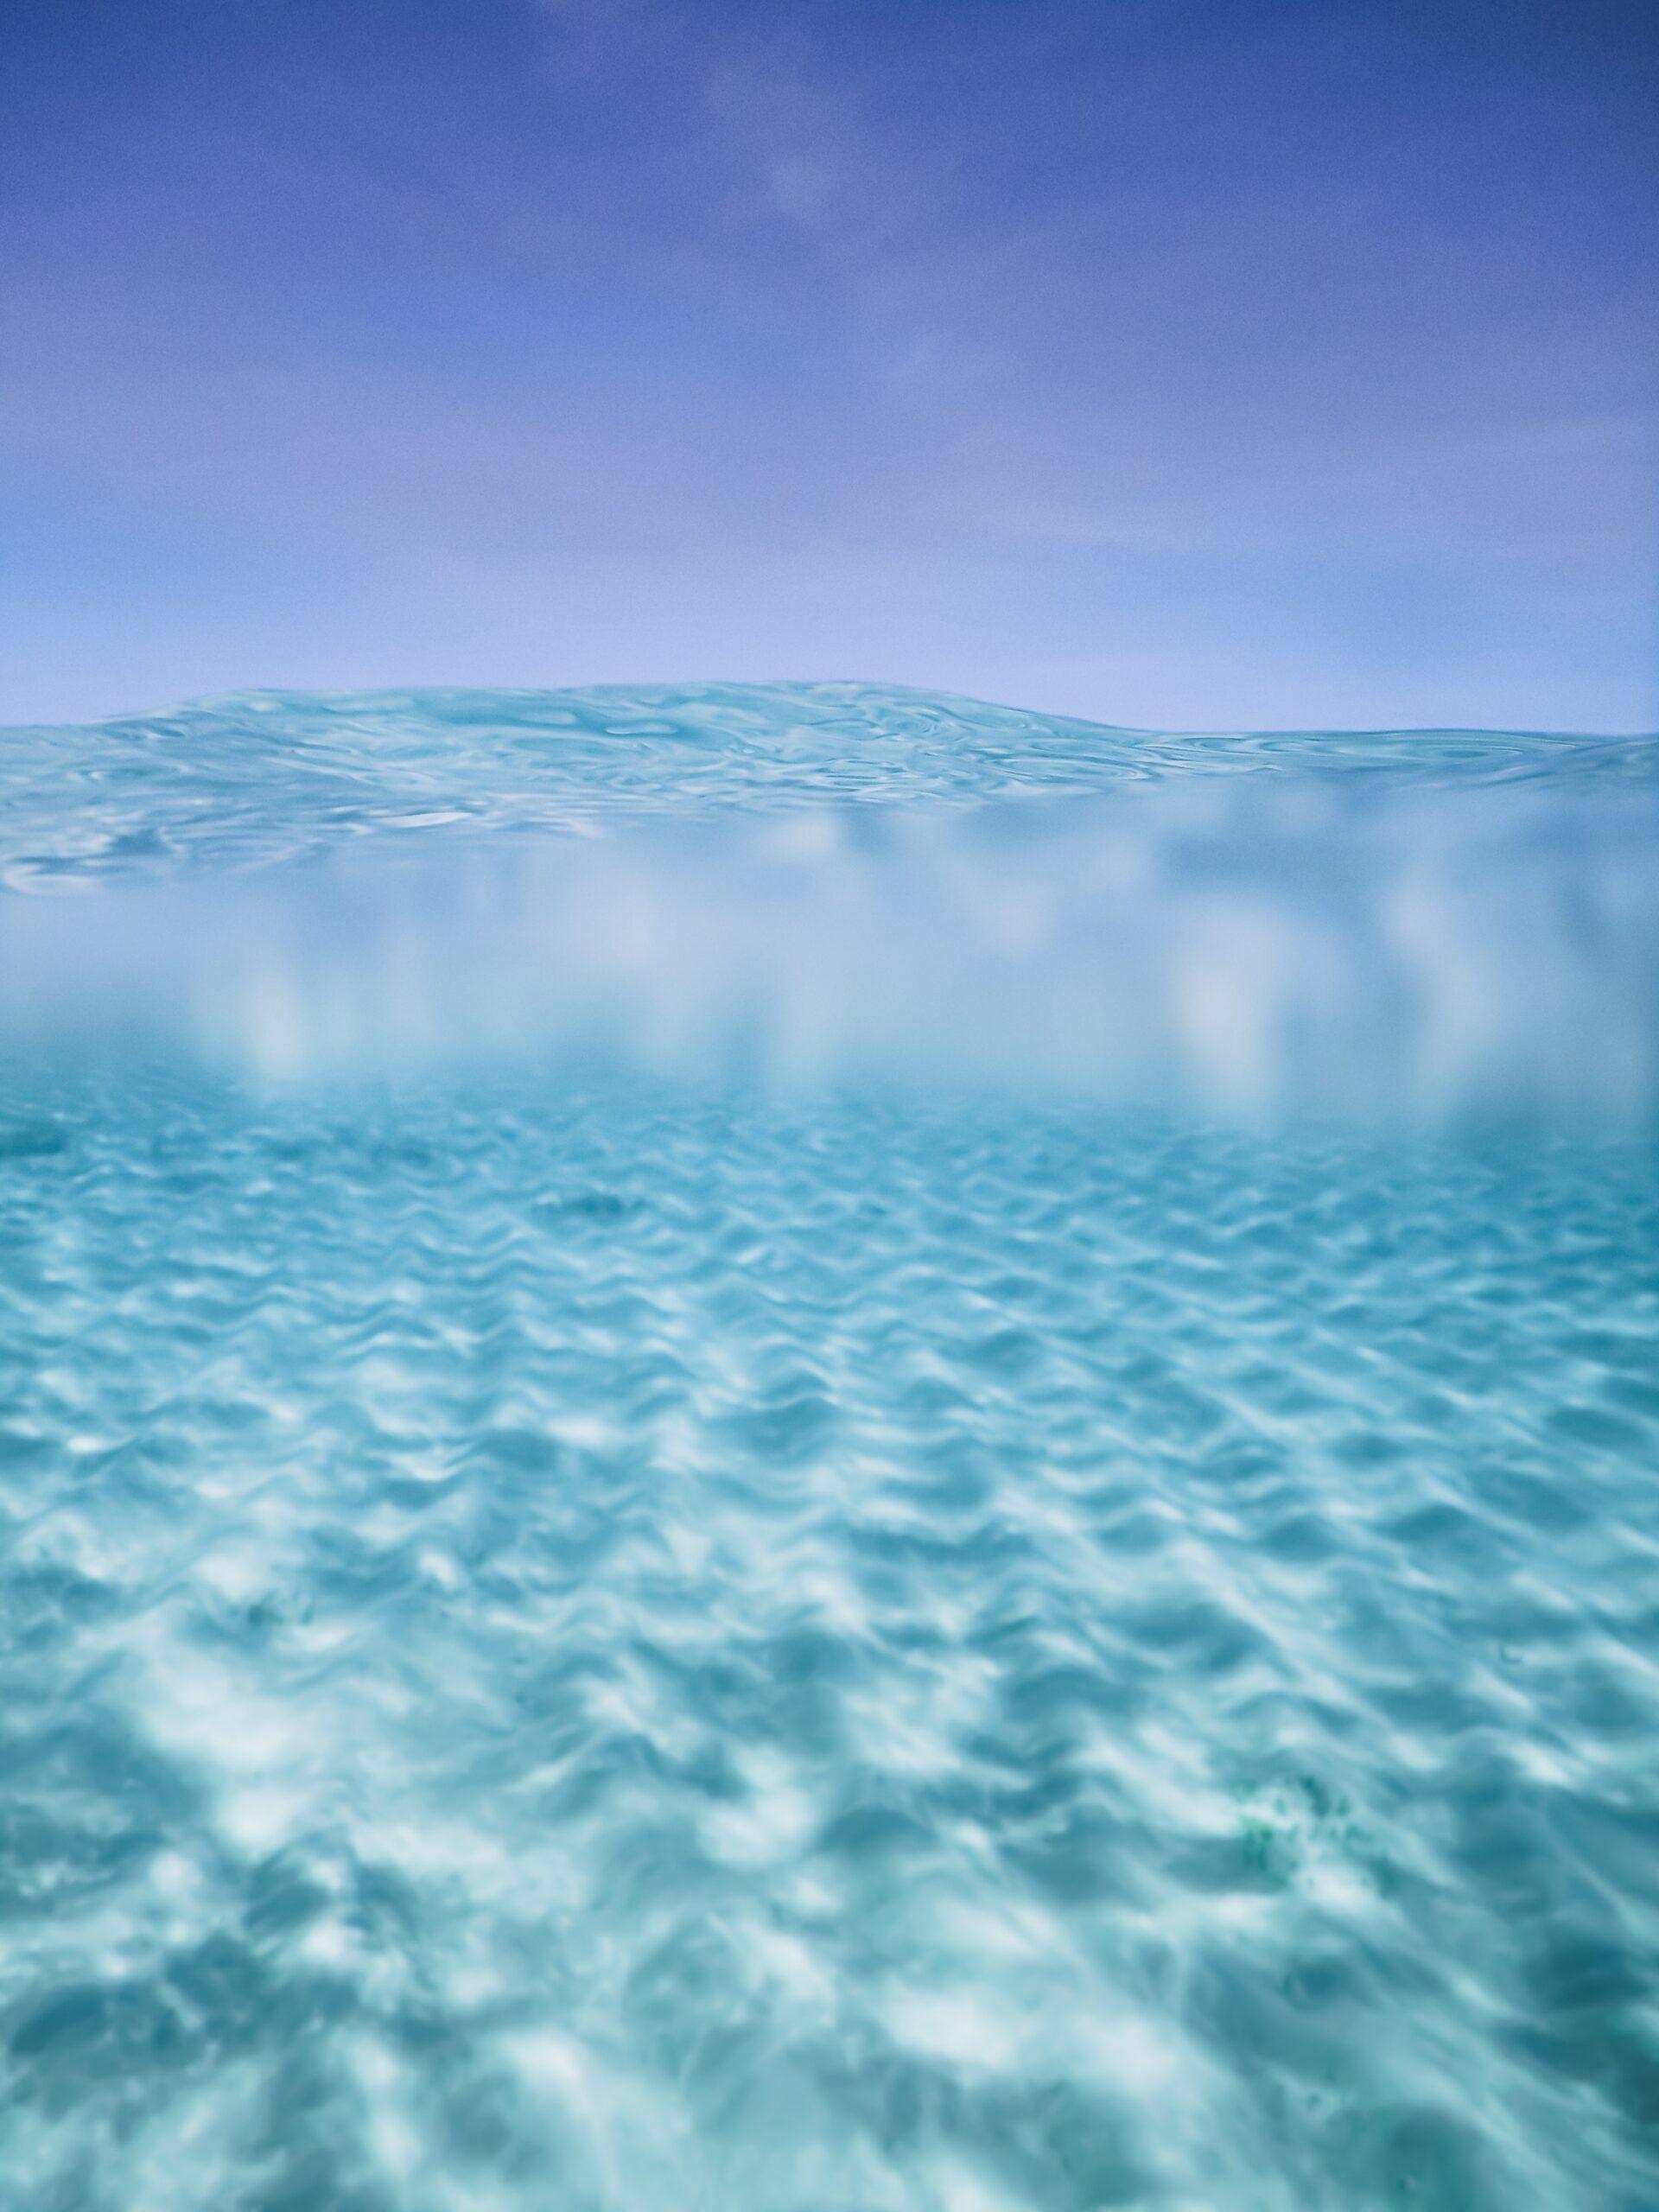 analia-ferrario-Crystal blue ocean bahama-unsplash